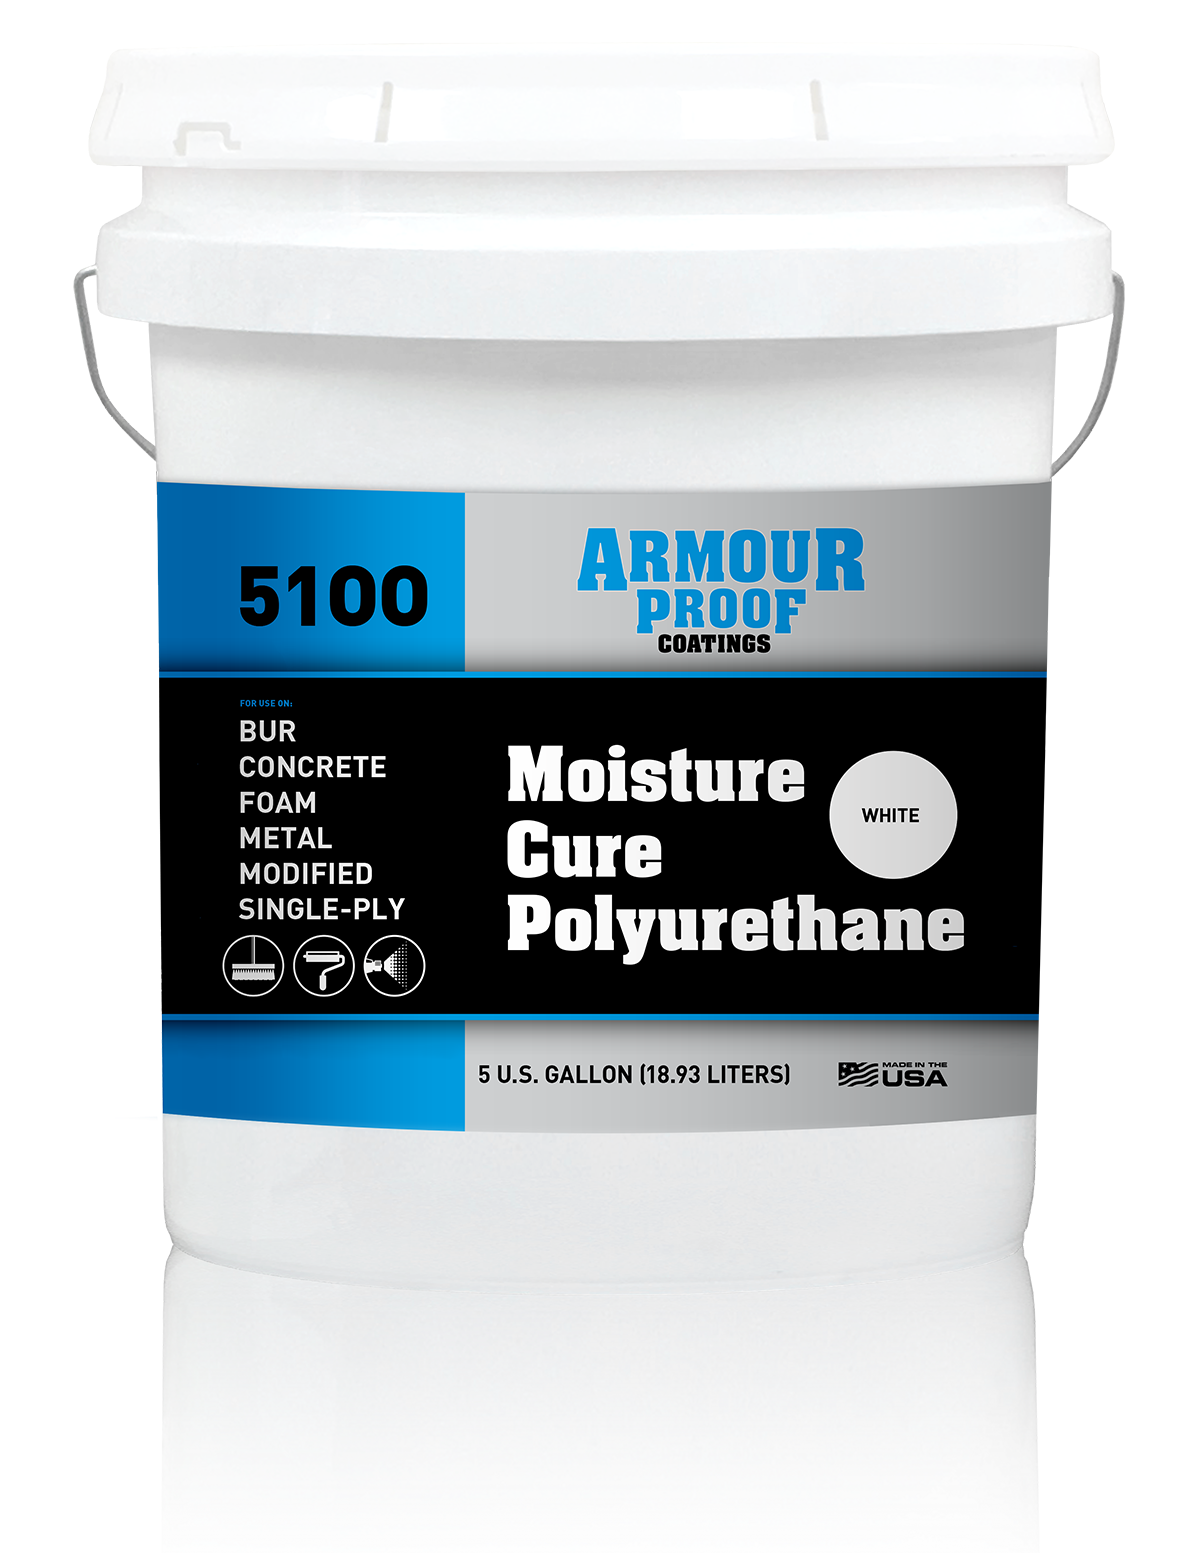 Armour Proof 5100 Moisture Cure Polyurethane - 5 Gallon Bucket